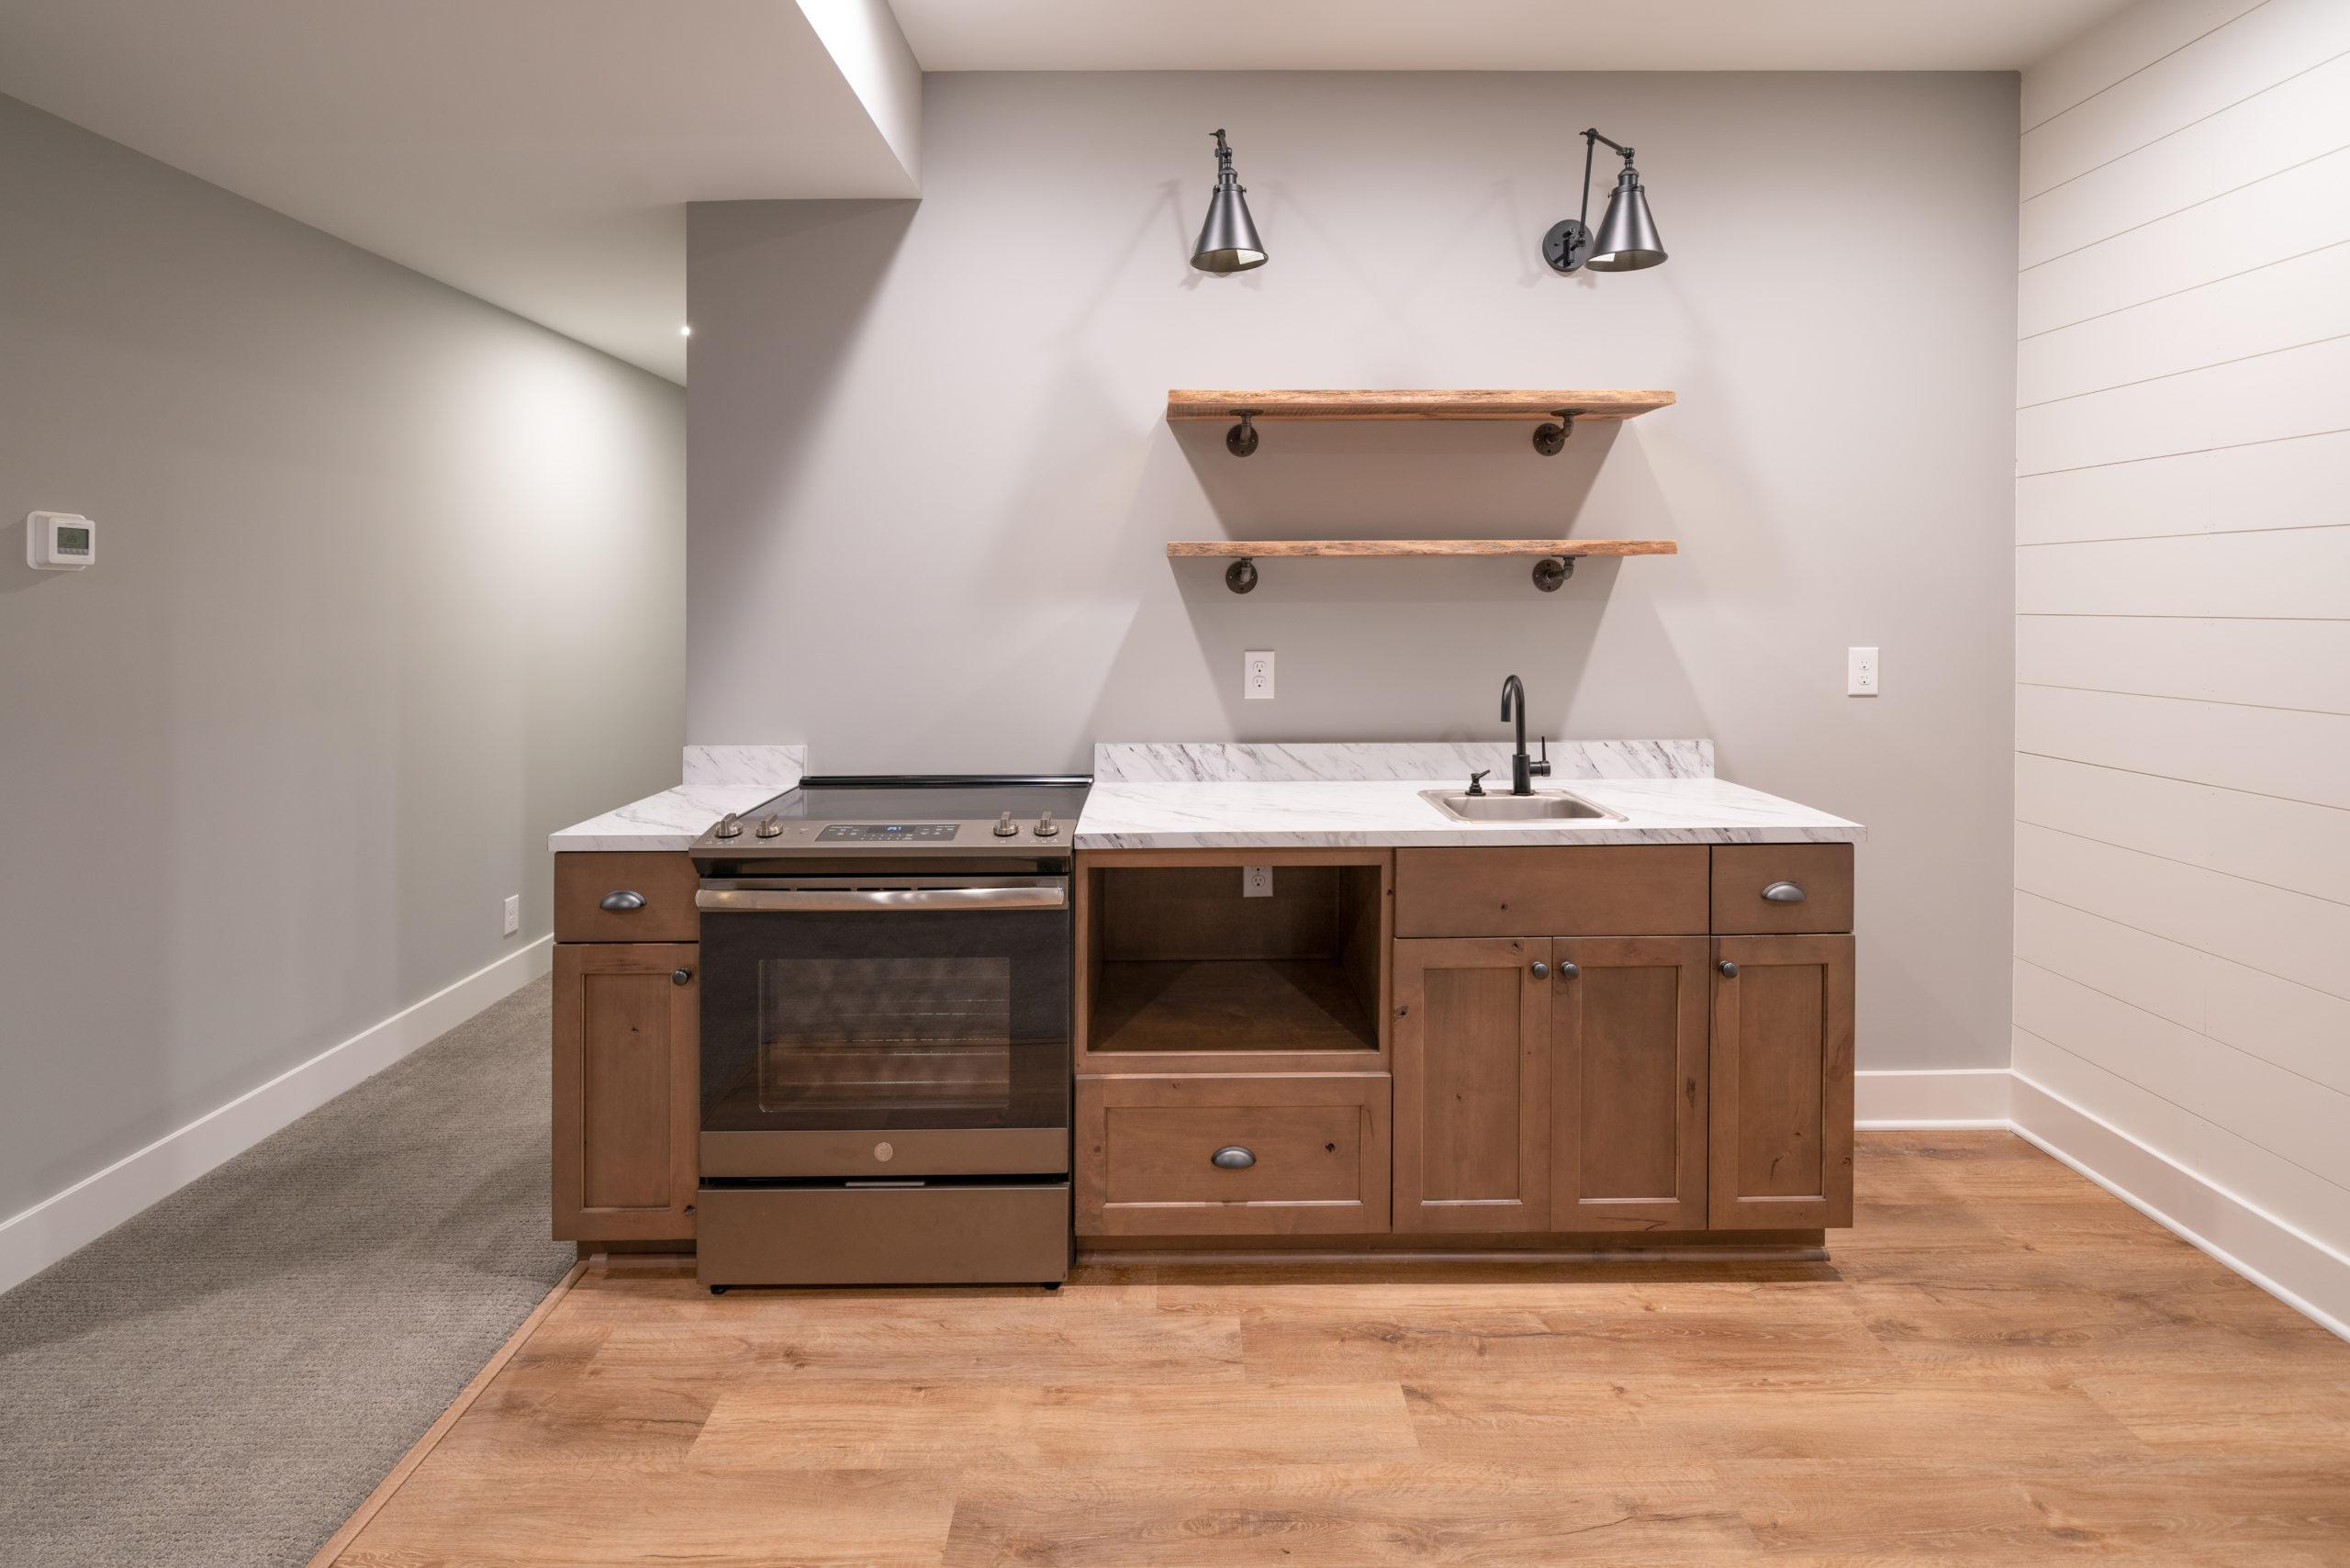 mini kitchen in basement with hardwood flooring